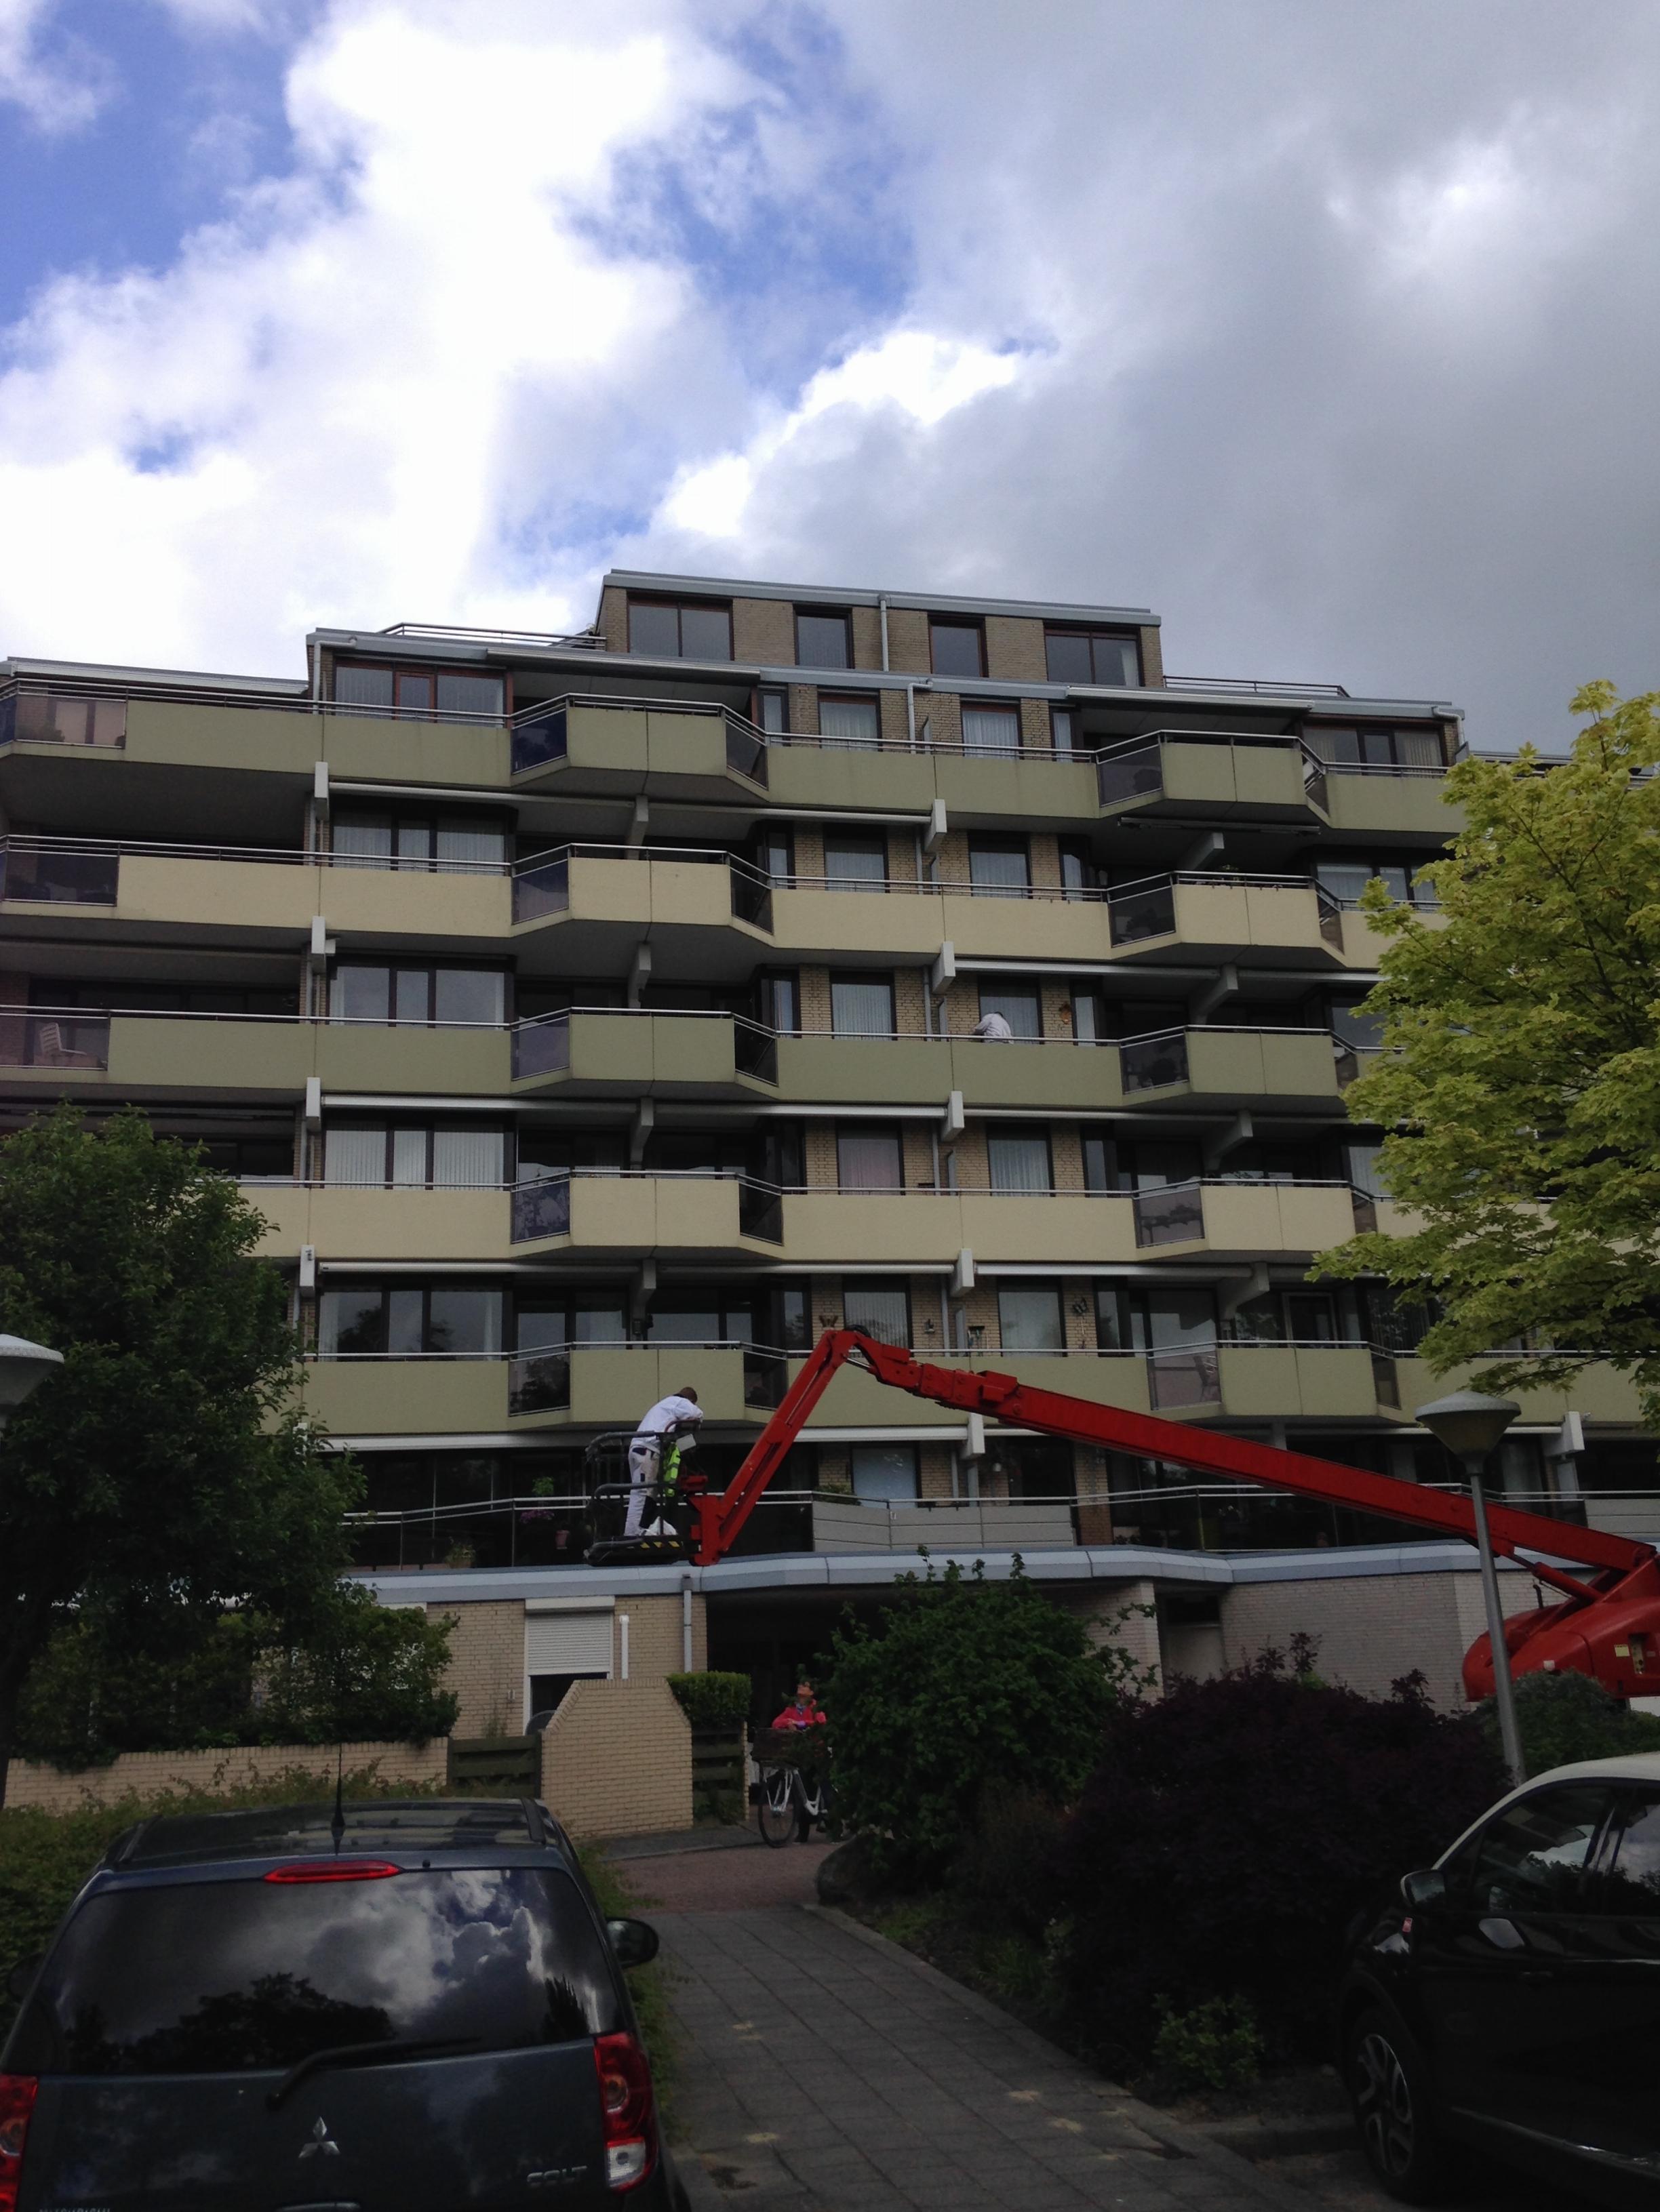 Schilderwerk VvE appartementencomplex, Nieuwegein